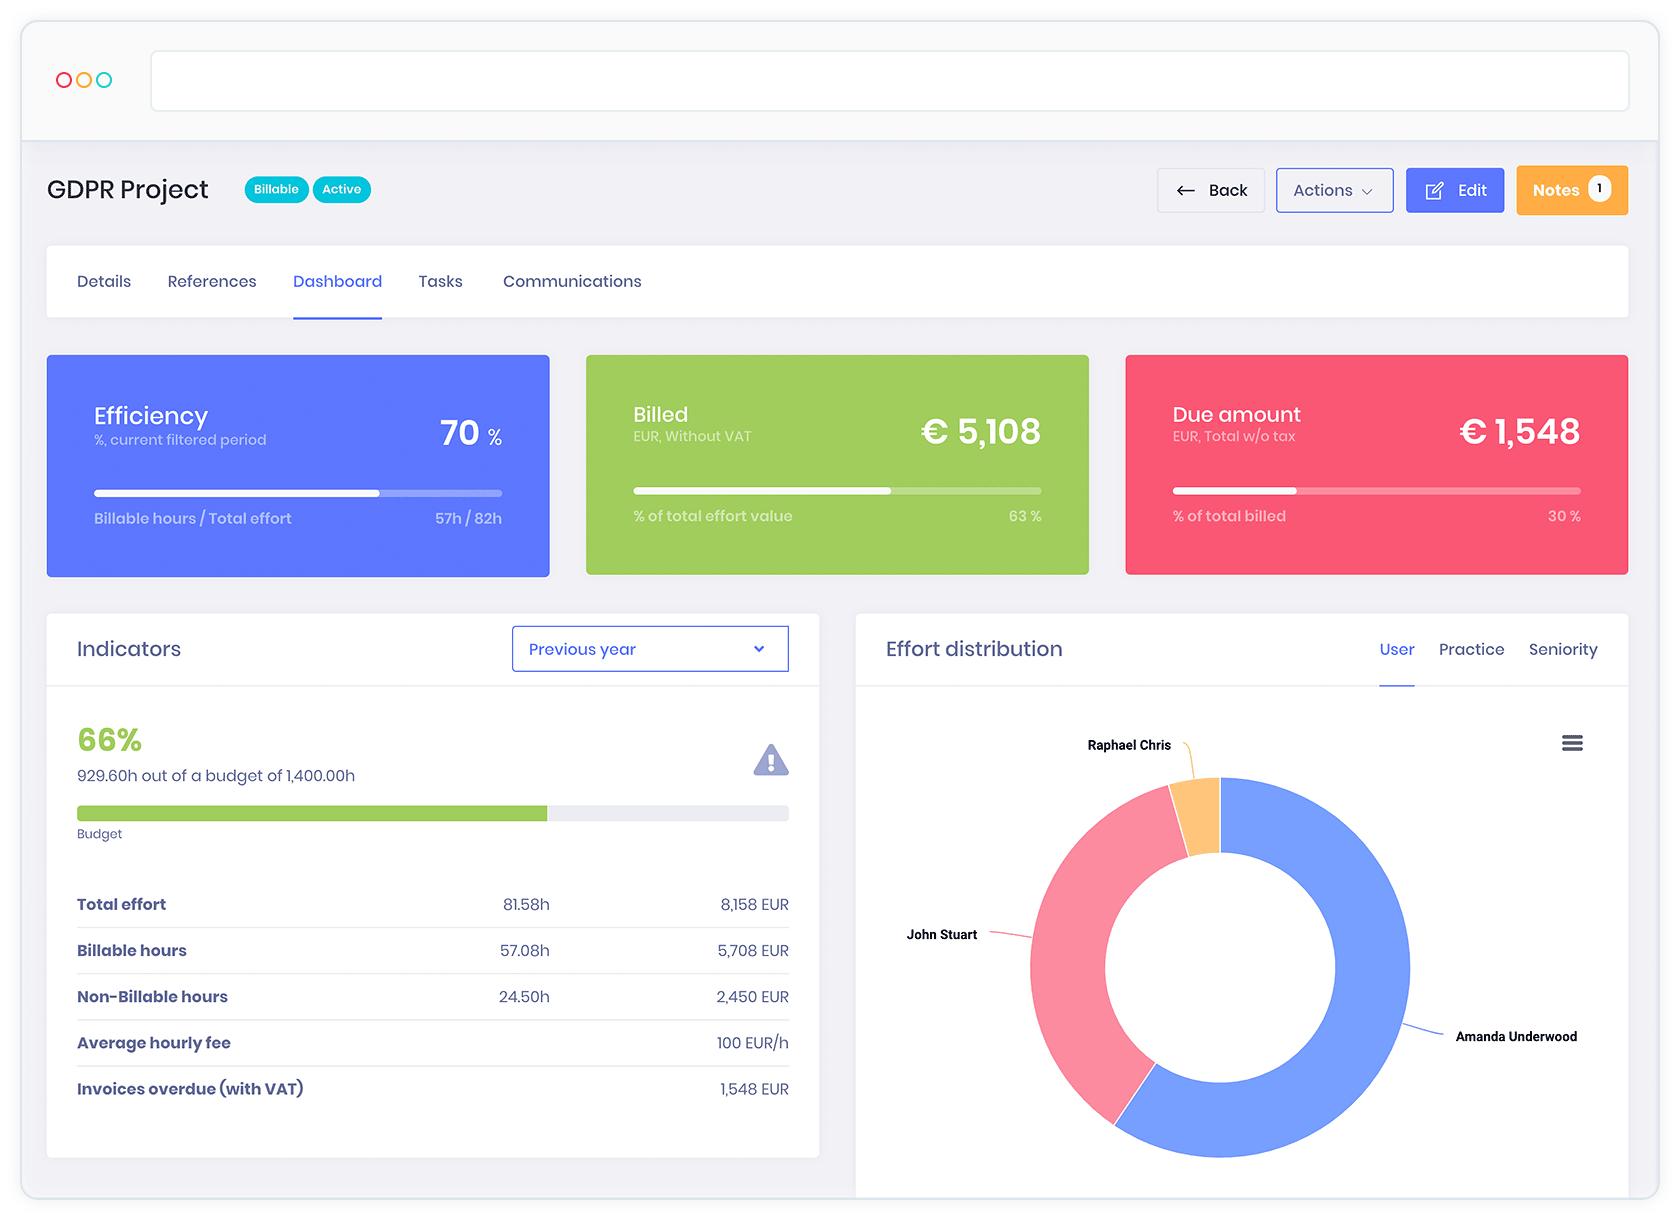 keyvision facturi dosare